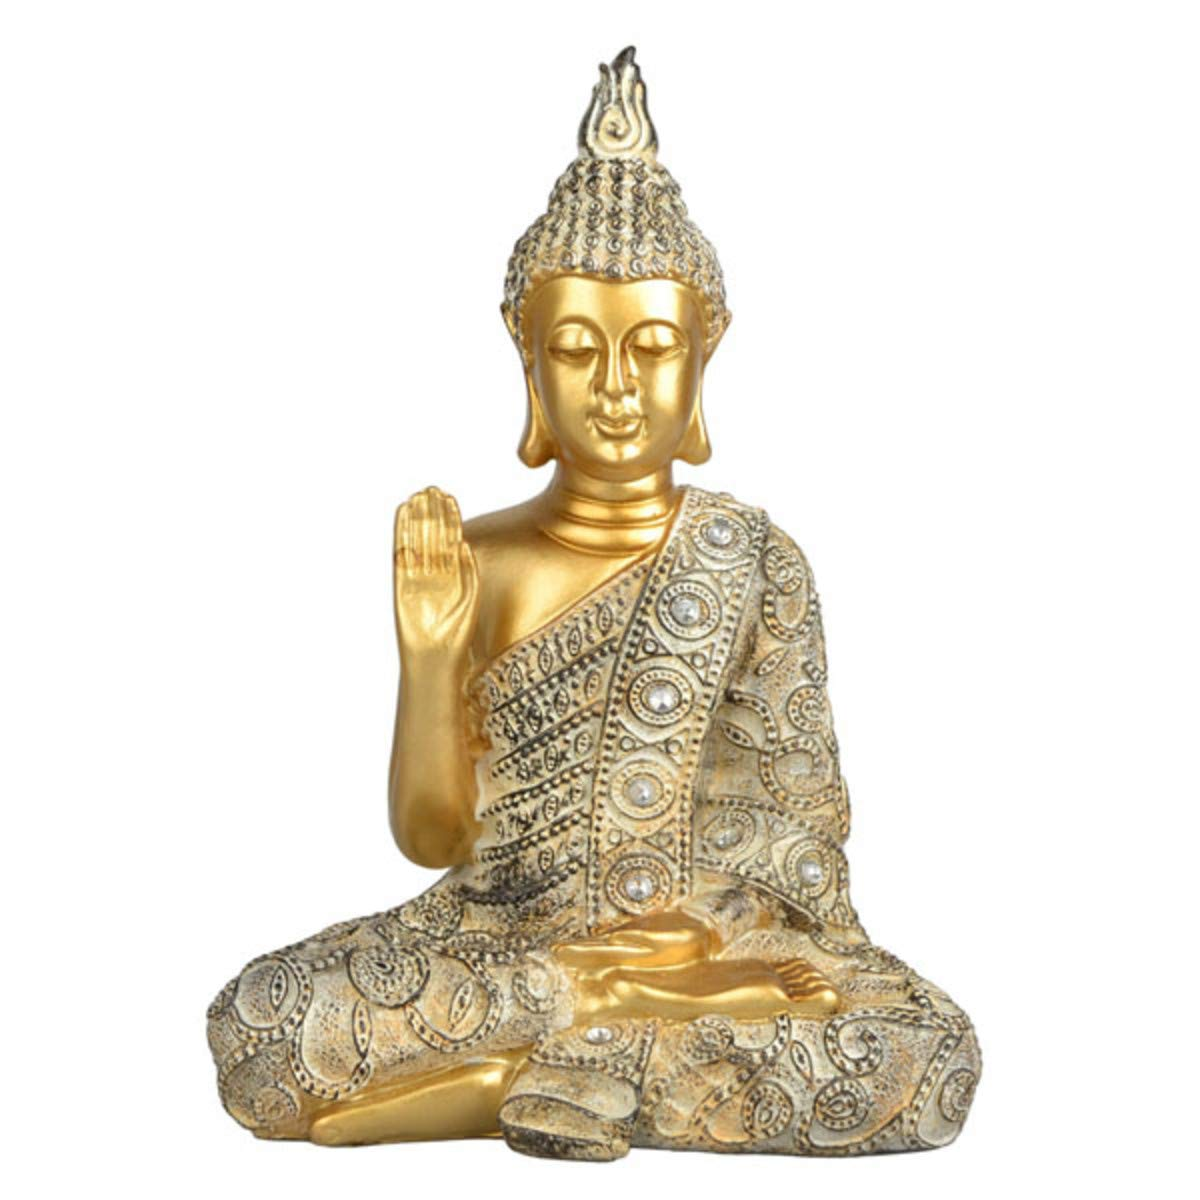 "4Rissa Meditating Blessing Medicine Buddha Statuette - Polyresin / 9.5"" Tibetan Statue Figure Figurine Zen Yoga Meditation Home Decor"